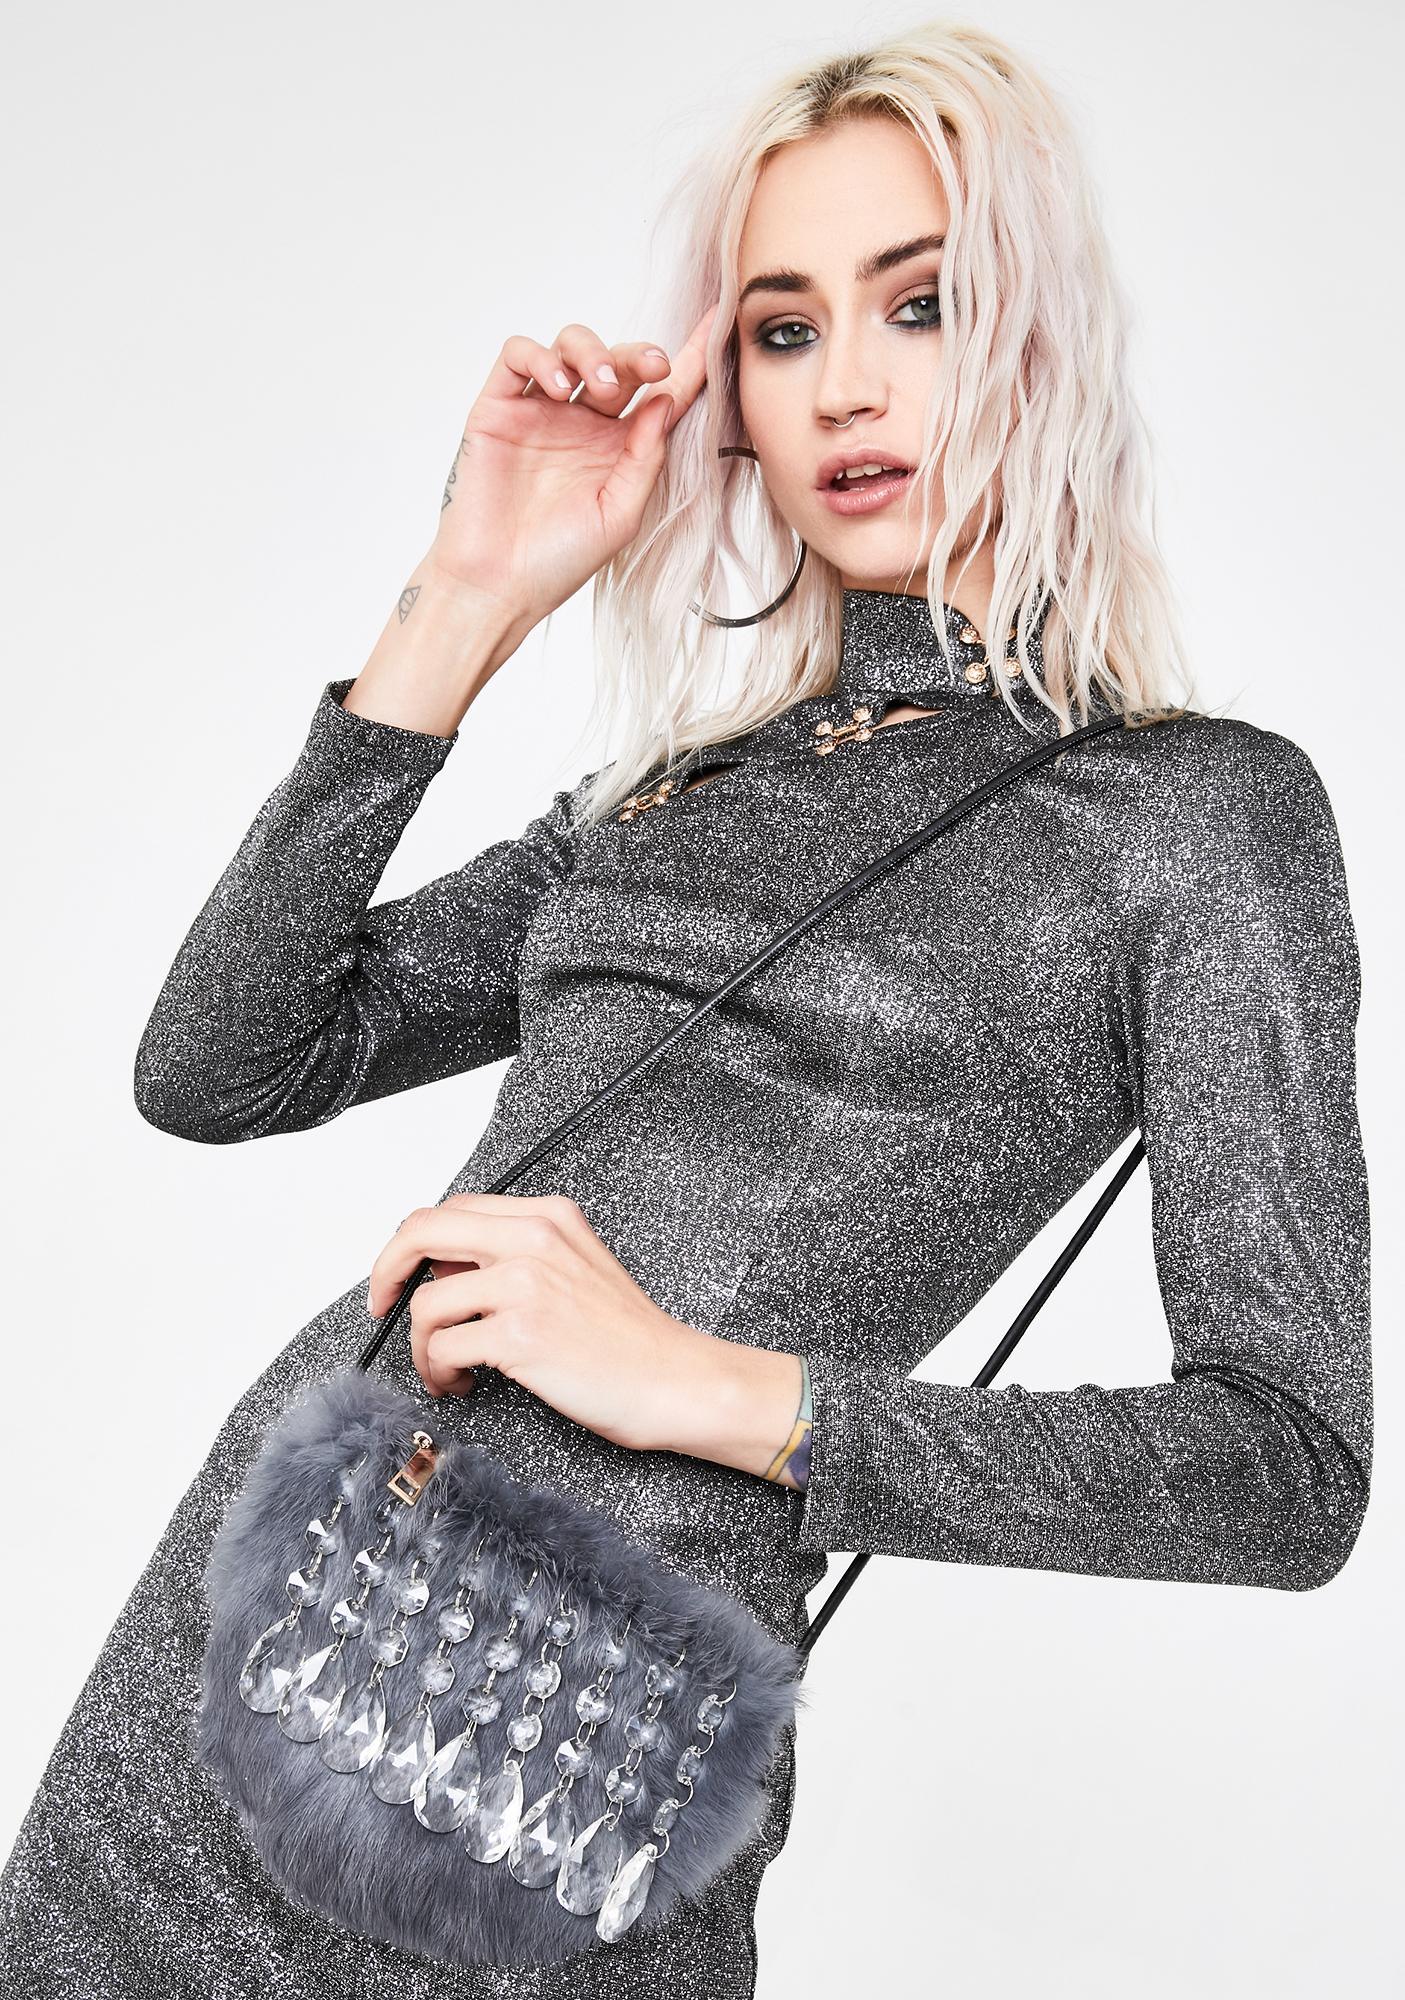 Crystal Chandelier Faux Fur Purse